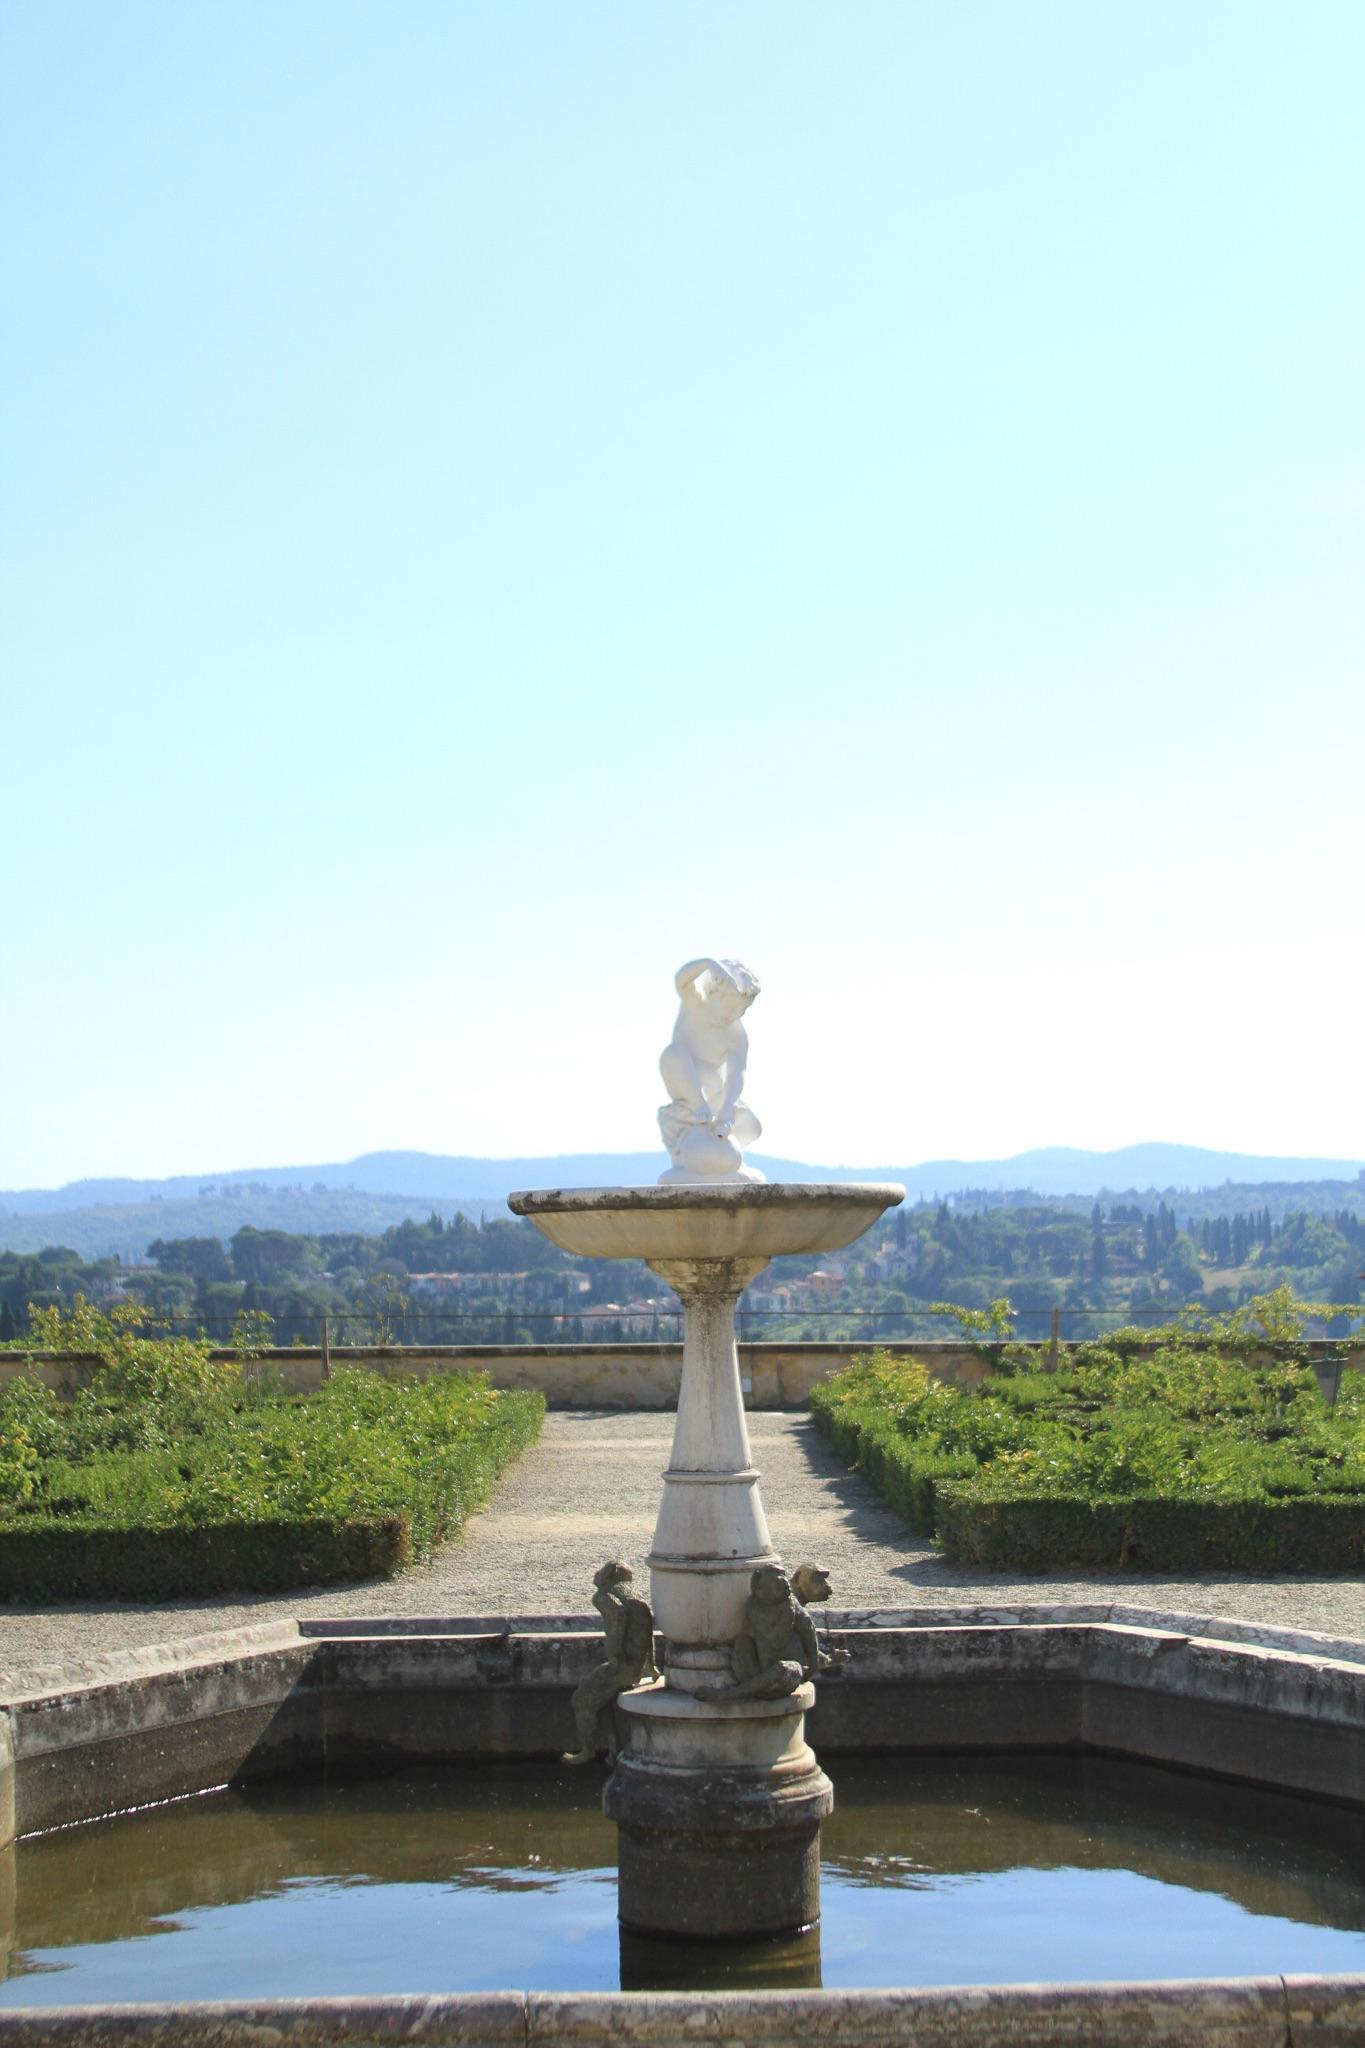 Ten-Days-Florence-Tuscany-Travel-Guide-MonicaFrancis-3